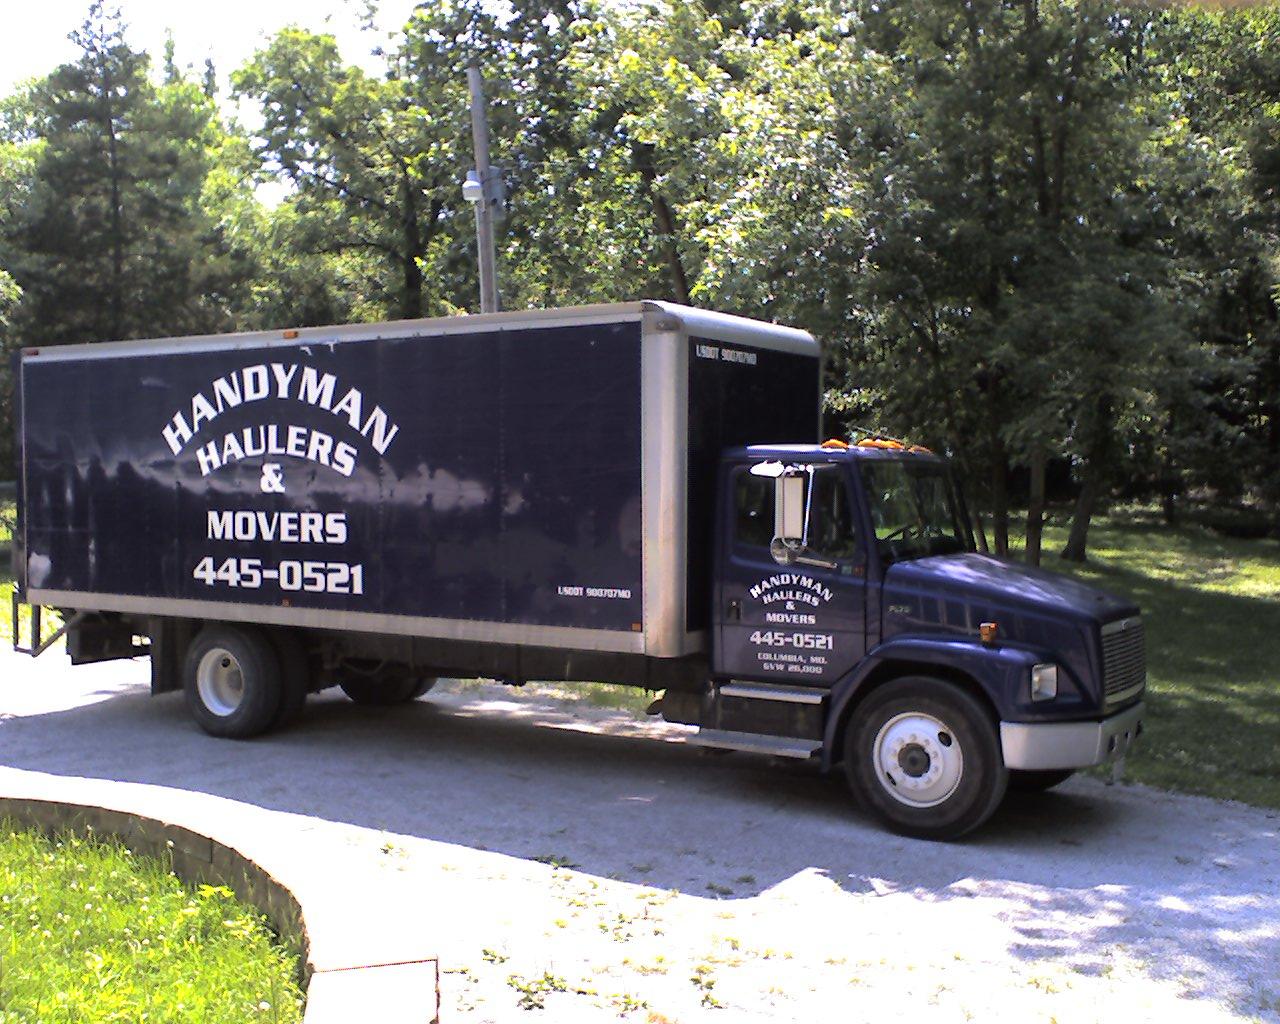 Handyman Haulers Moving Service